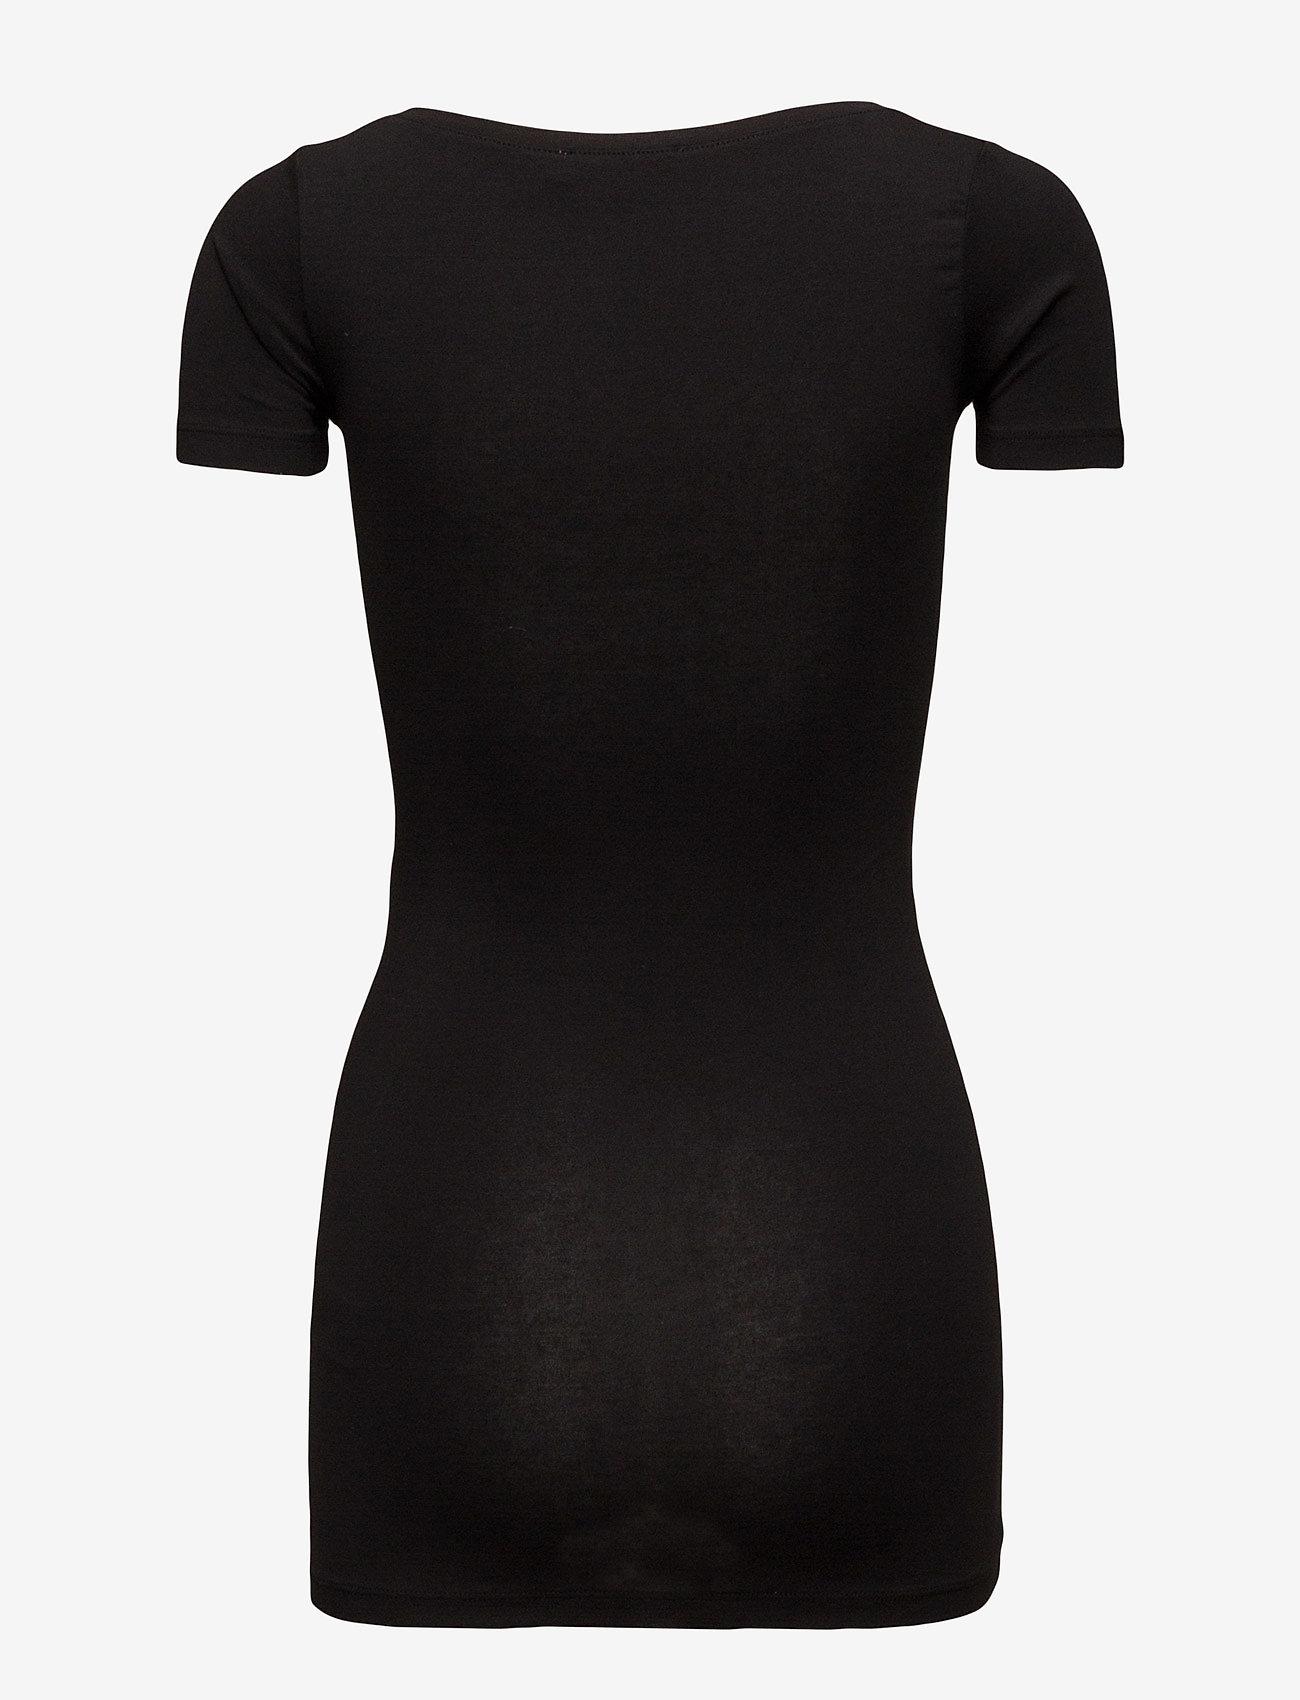 Samsøe Samsøe - Sadie solid 265 - basic t-shirts - black - 1